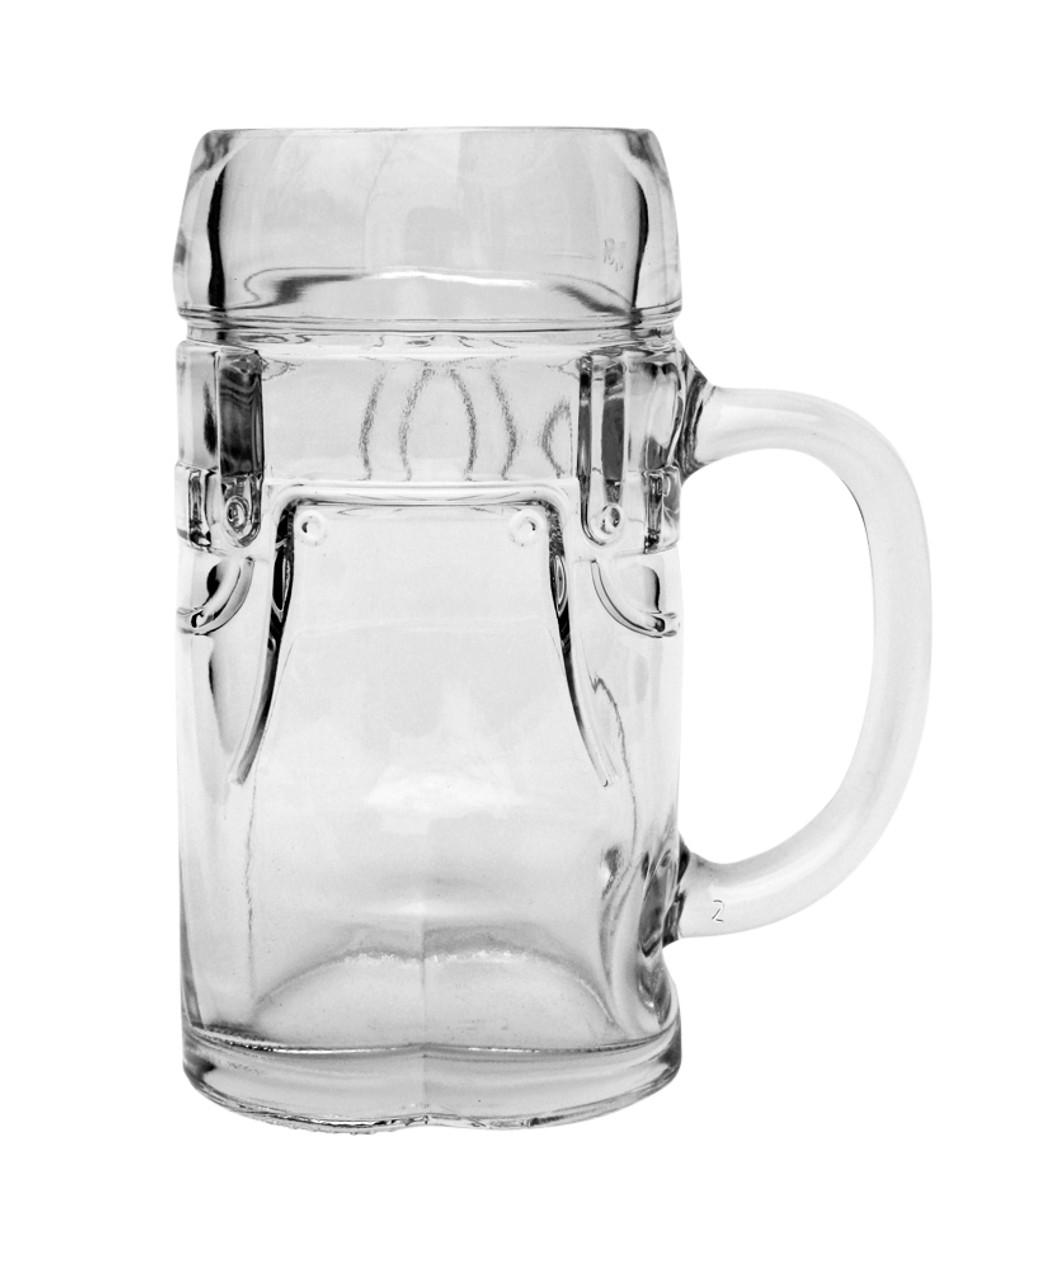 Empty Half Liter Lederhosen Beer Mug Front View